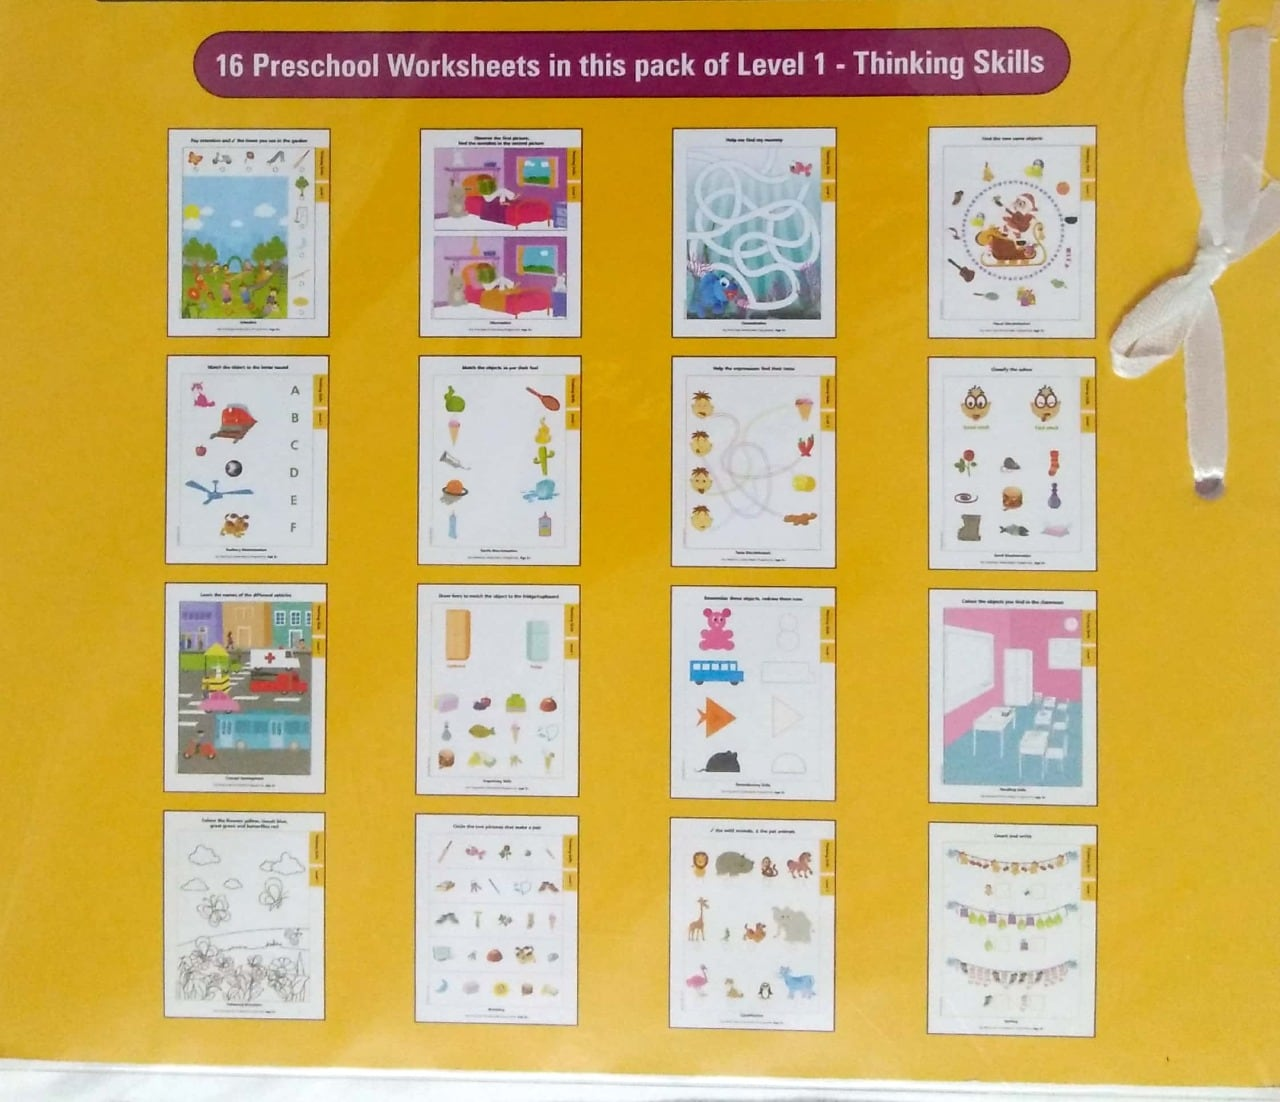 My Preschool Worksheets Thinking Skill Level 1 (Age3+)